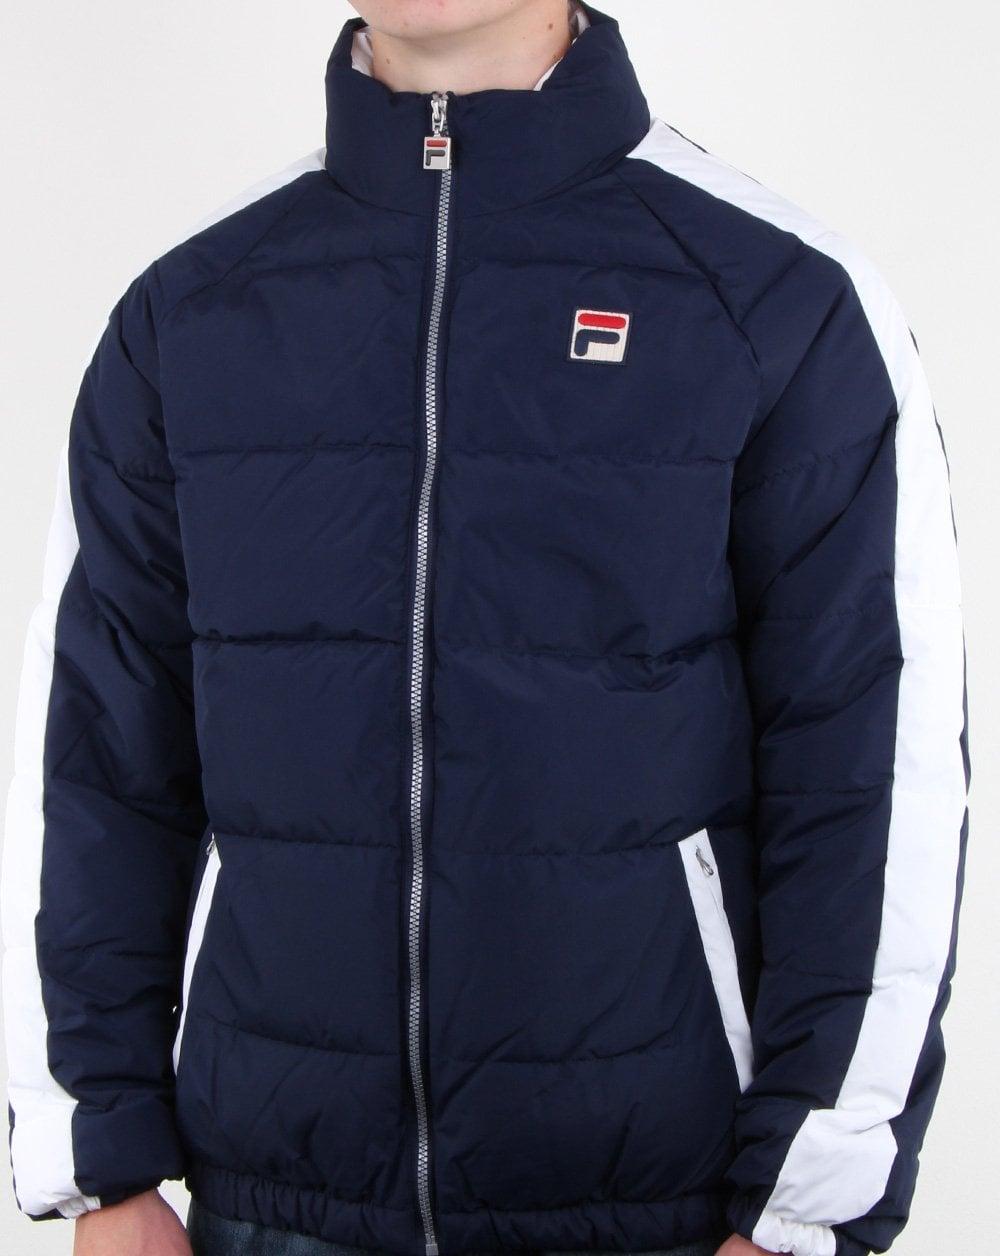 exquisite design clearance prices finest selection Fila Vintage Puffer Jacket Navy,white, ski, ledger,Mens, Jacket,Padded